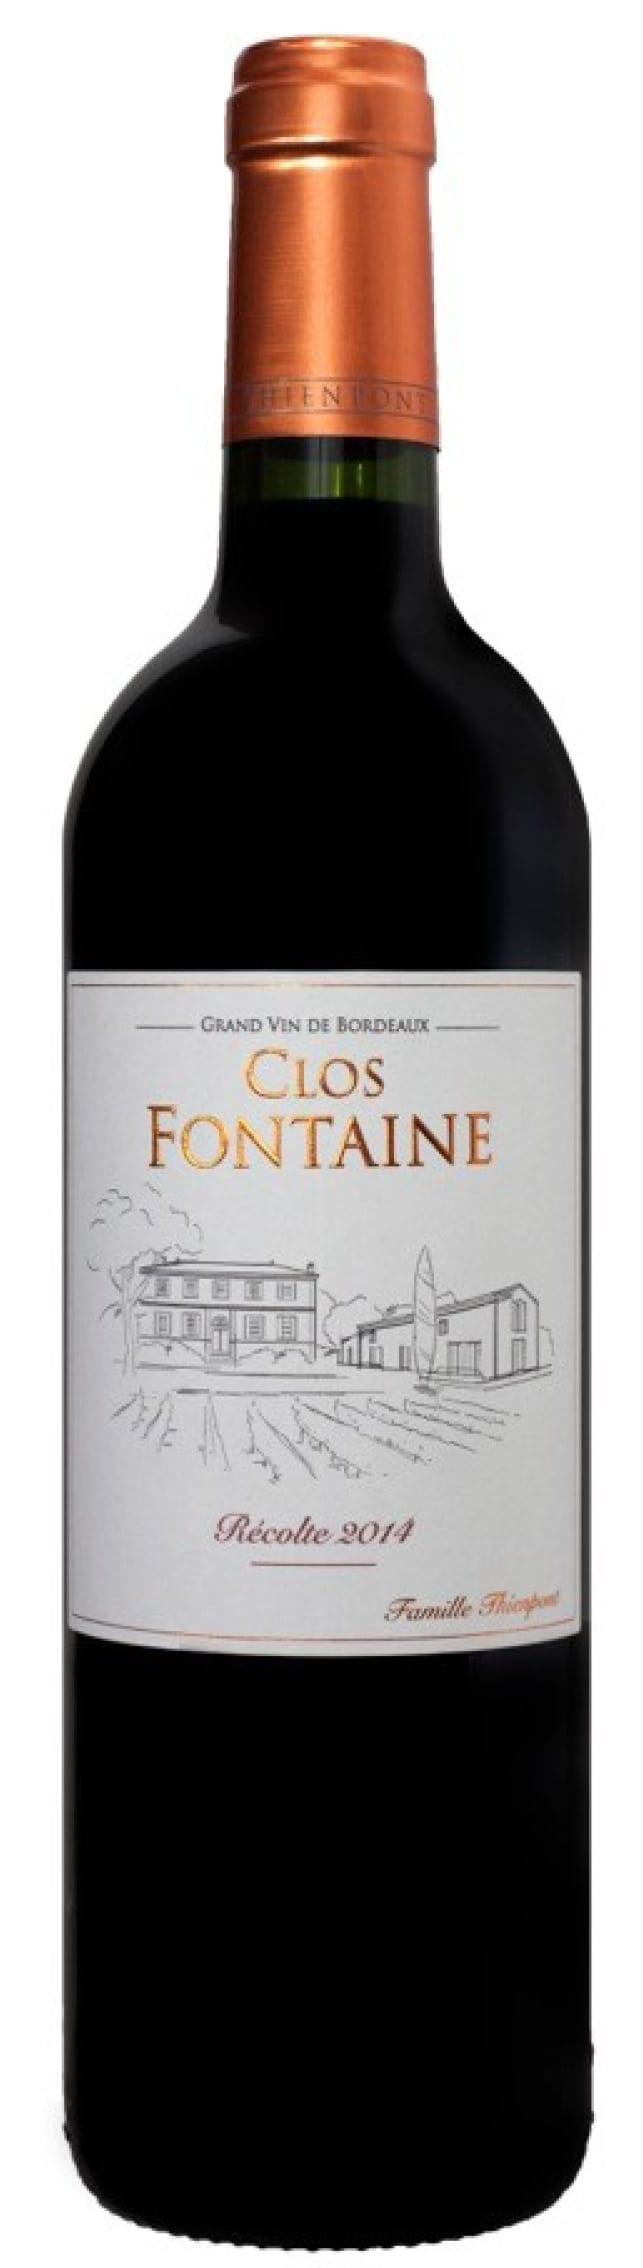 Chateau Clos Fontaine 2014